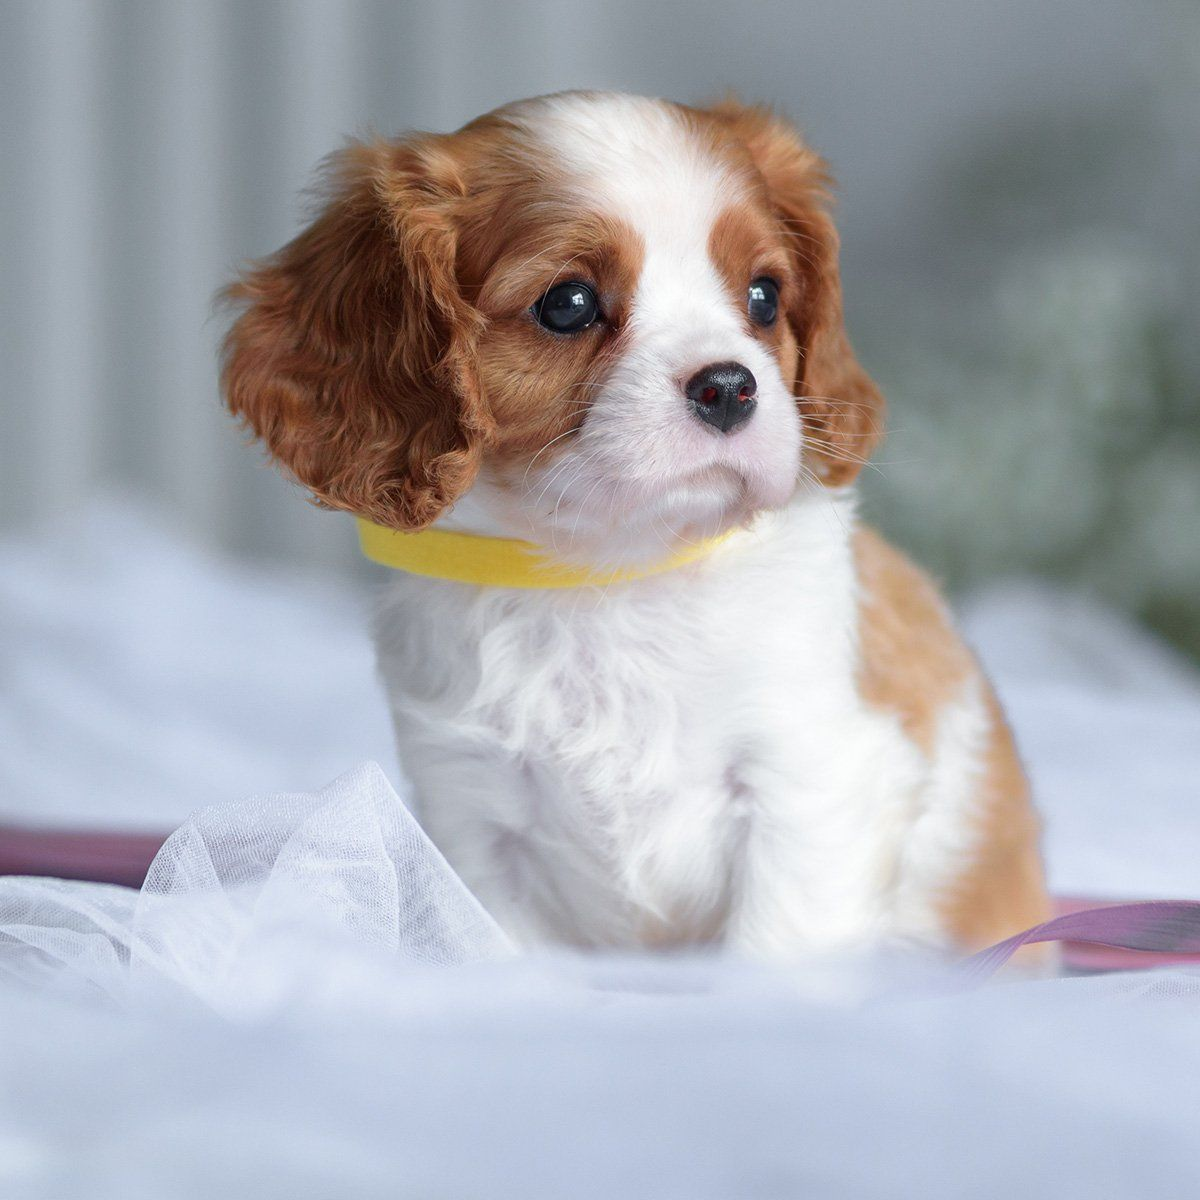 Petland Orlando South, Florida Premium Pets, Puppies